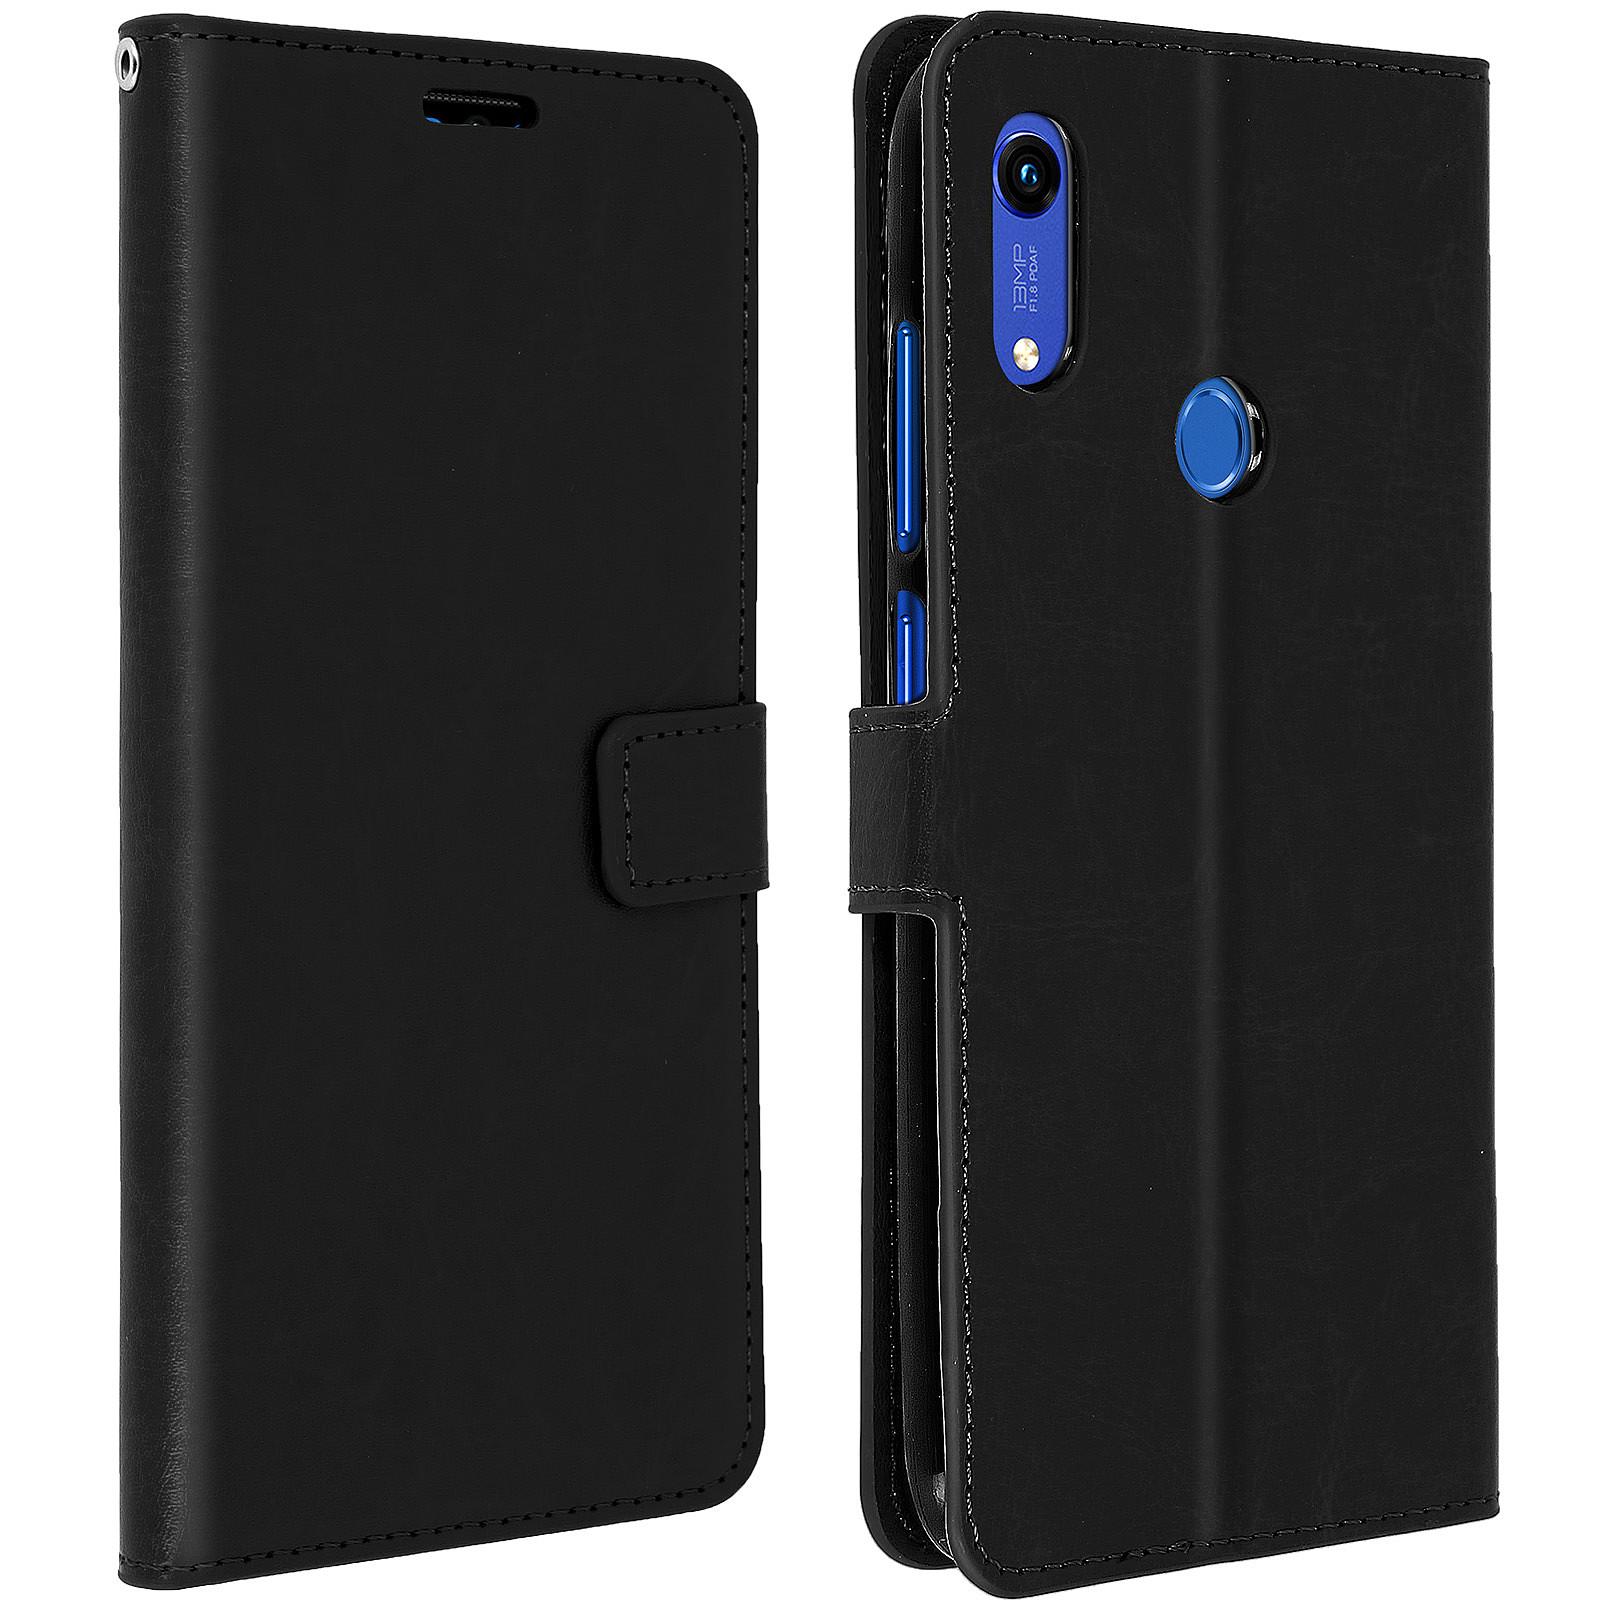 Avizar Etui folio Noir pour Huawei Y6 2019,Honor 8A